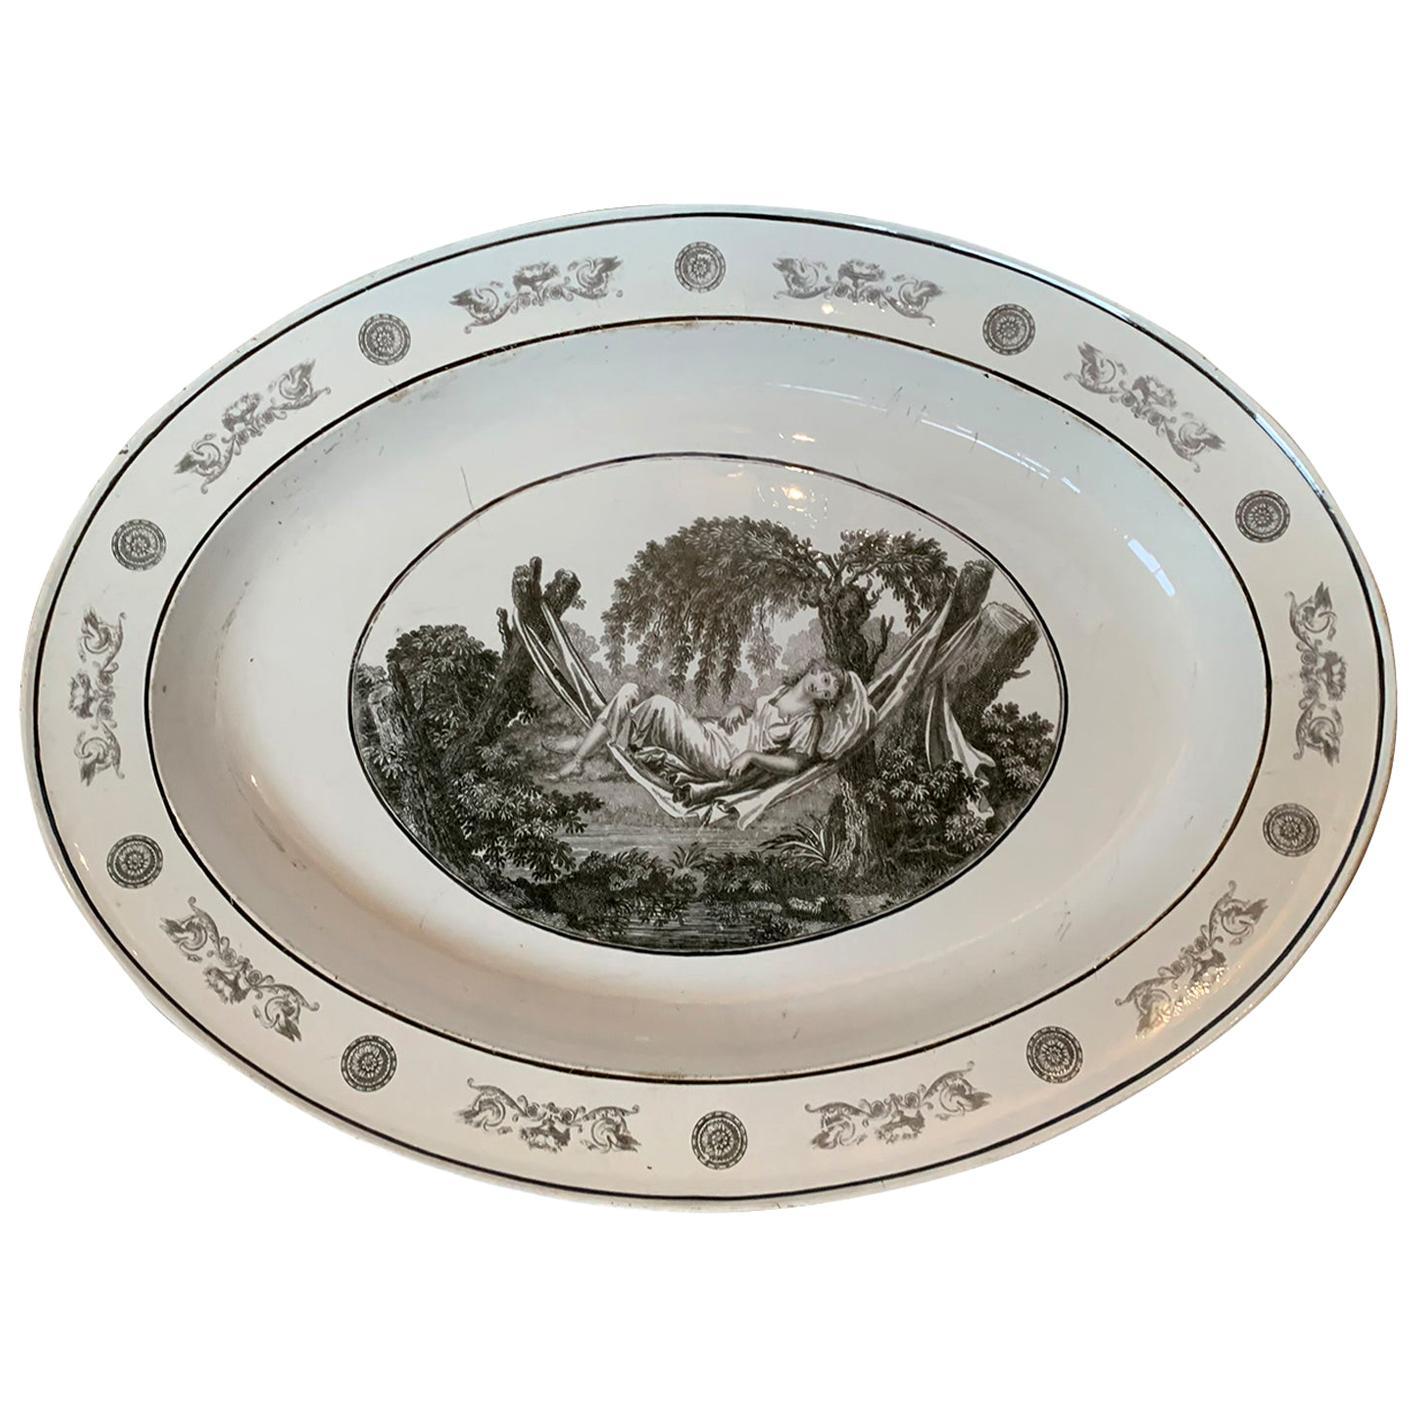 19th Century French Faience Creil-Montereau Glazed Transfer Earthenware Plate